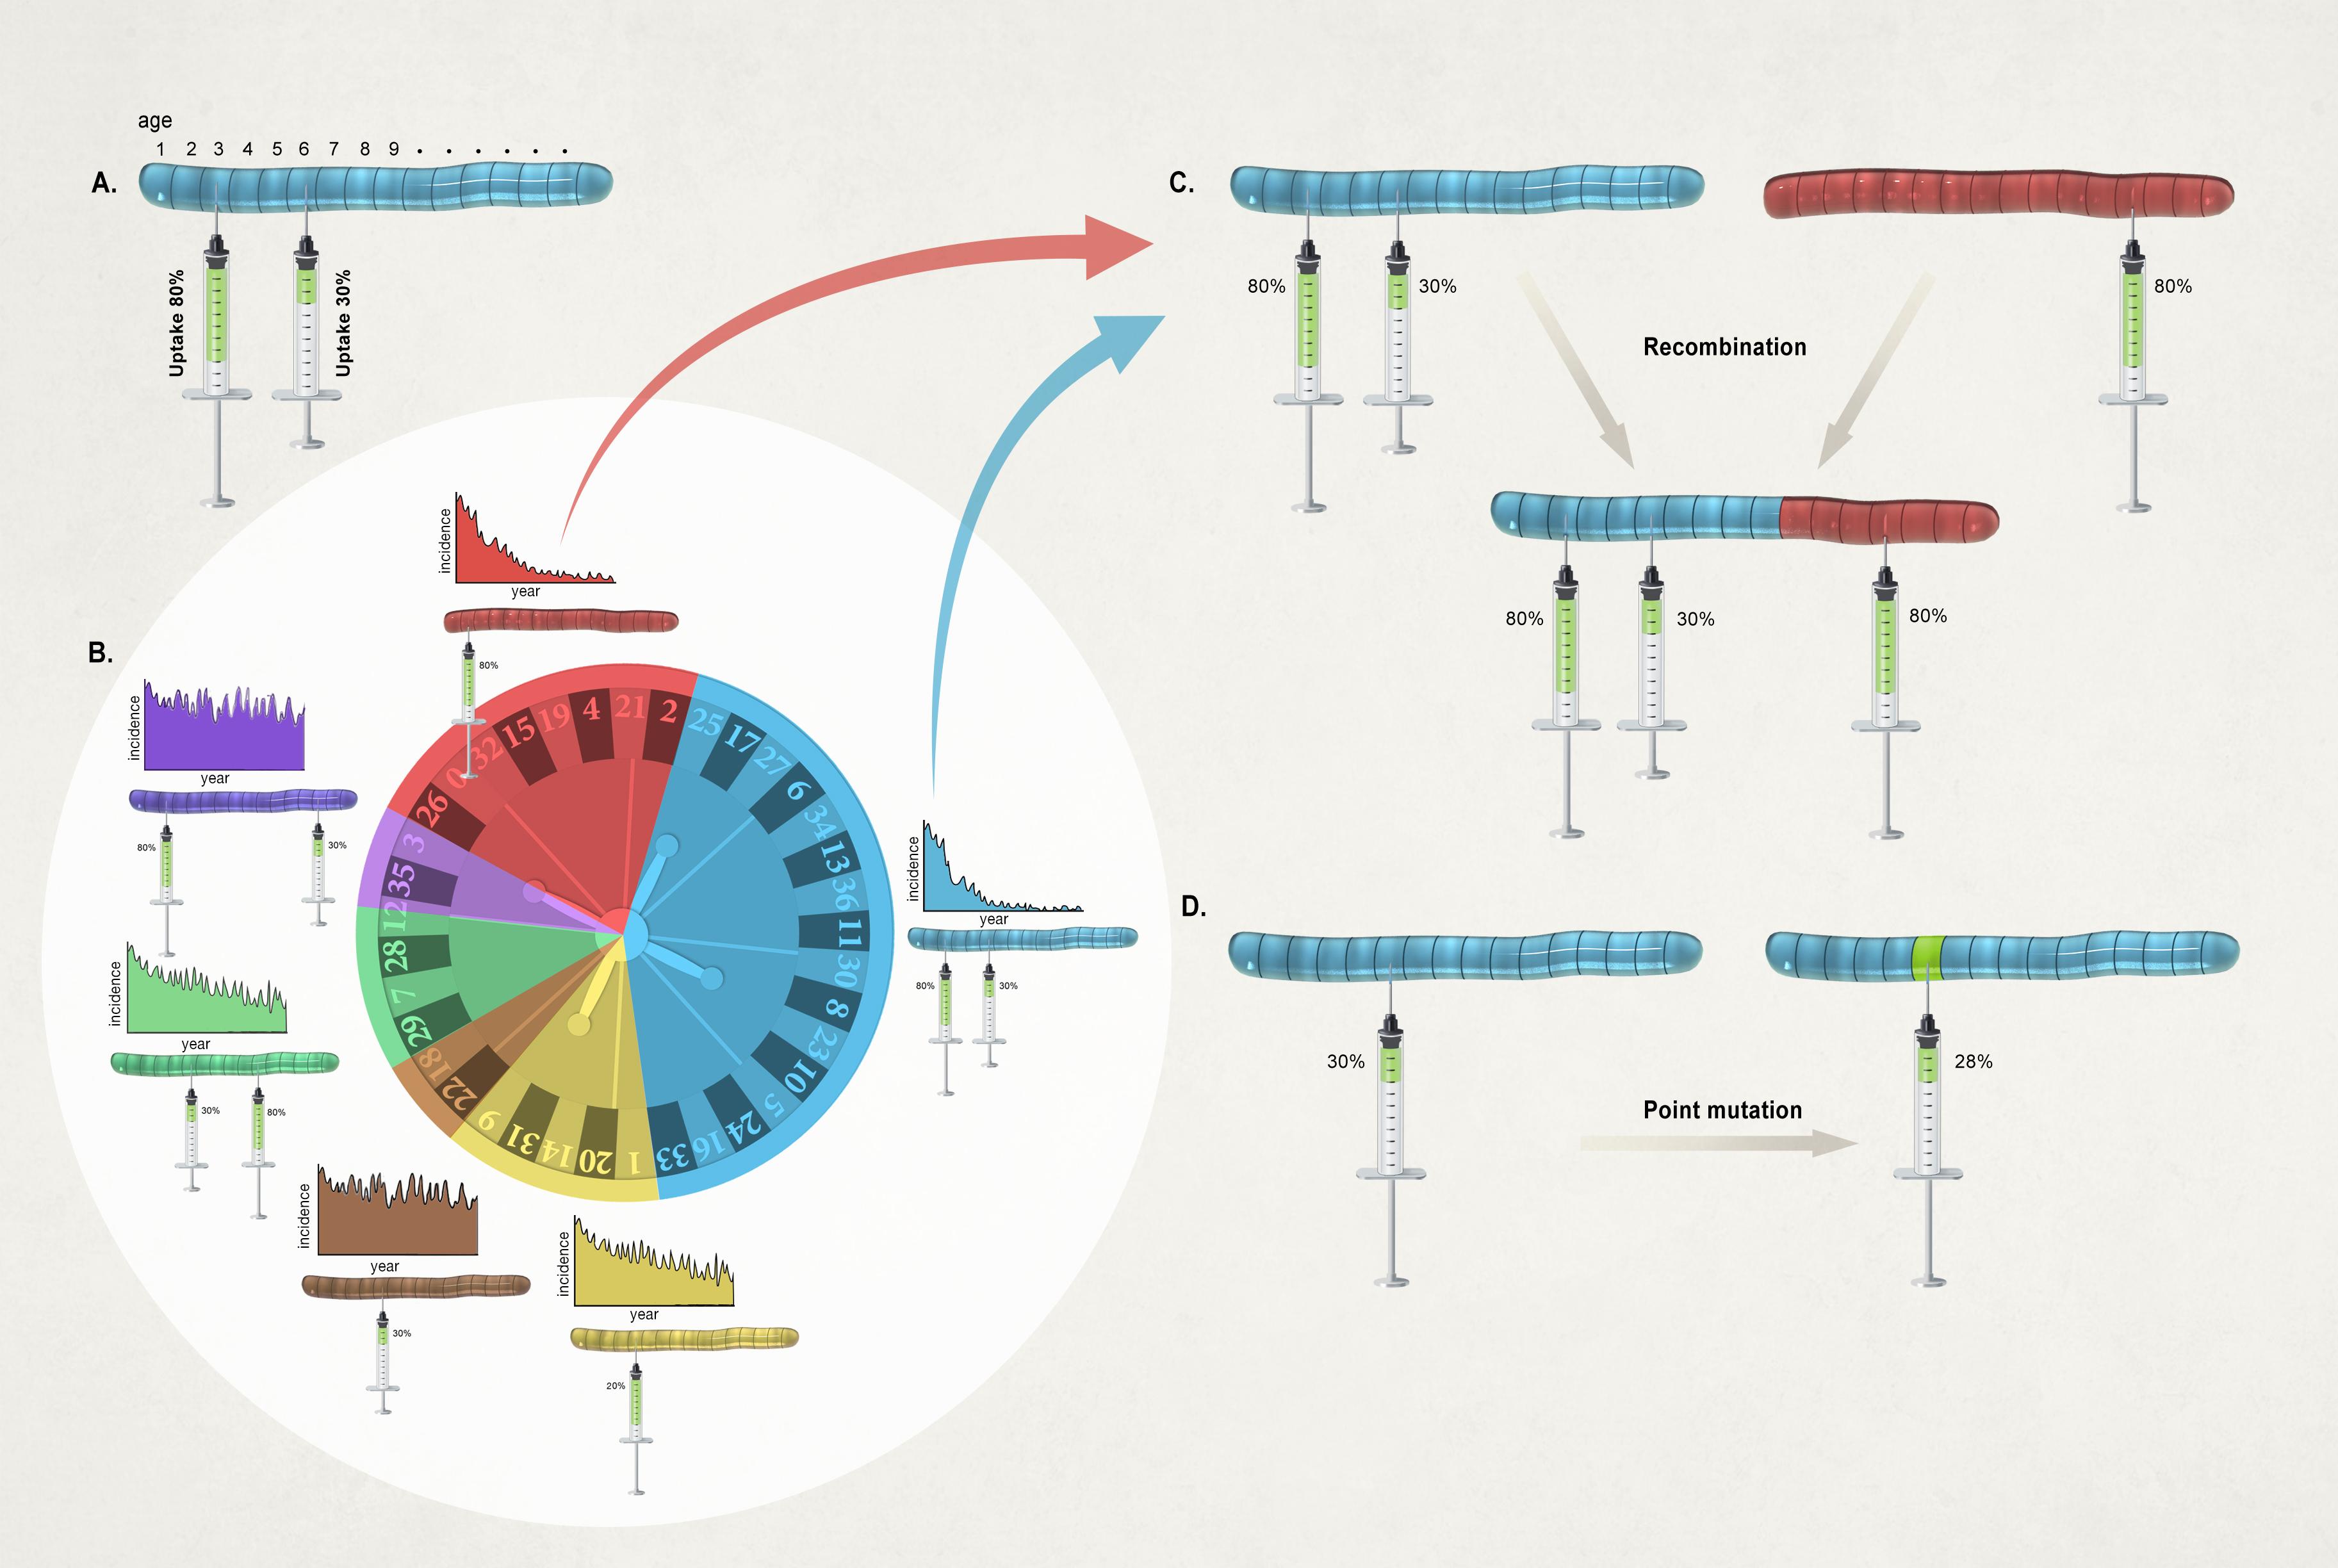 Schematic of genetic algorithm used in Riolo & Rohani (2015).